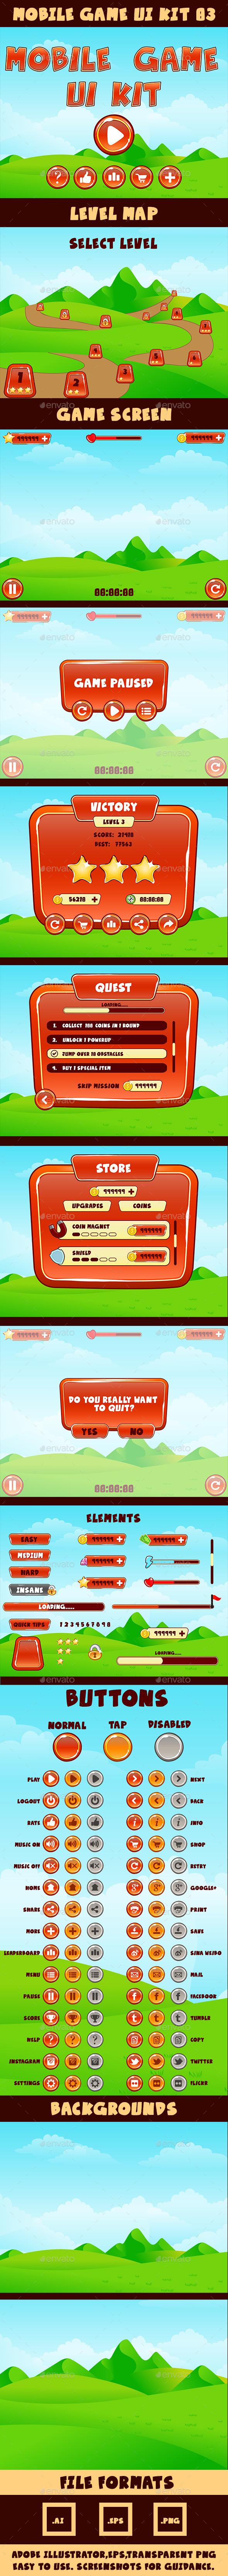 Mobile Game UI Kit 03 - User Interfaces Game Assets